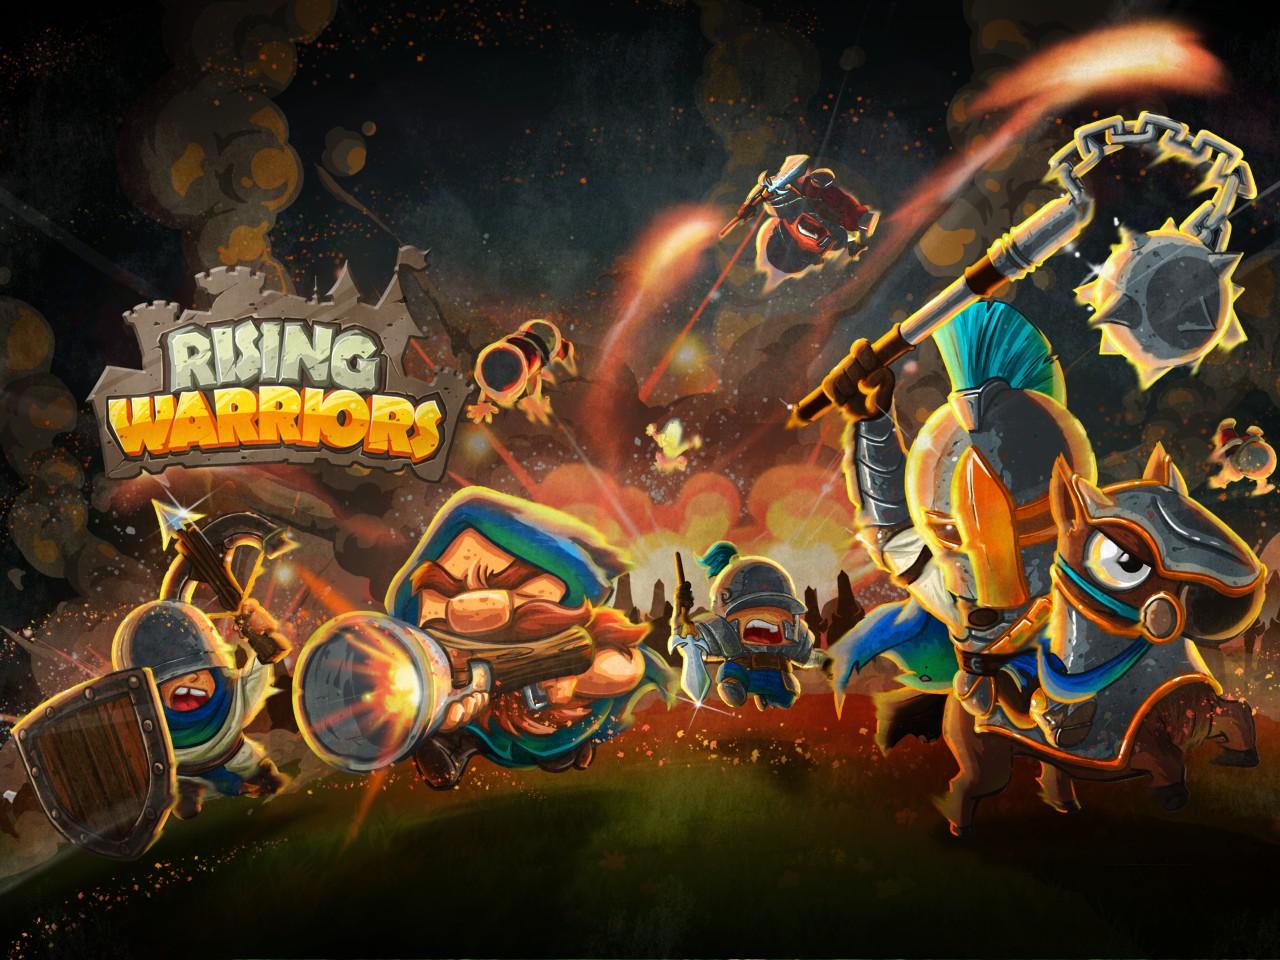 Rising Warriors' next huge, sandy update is due to go live next Thursday 1st September